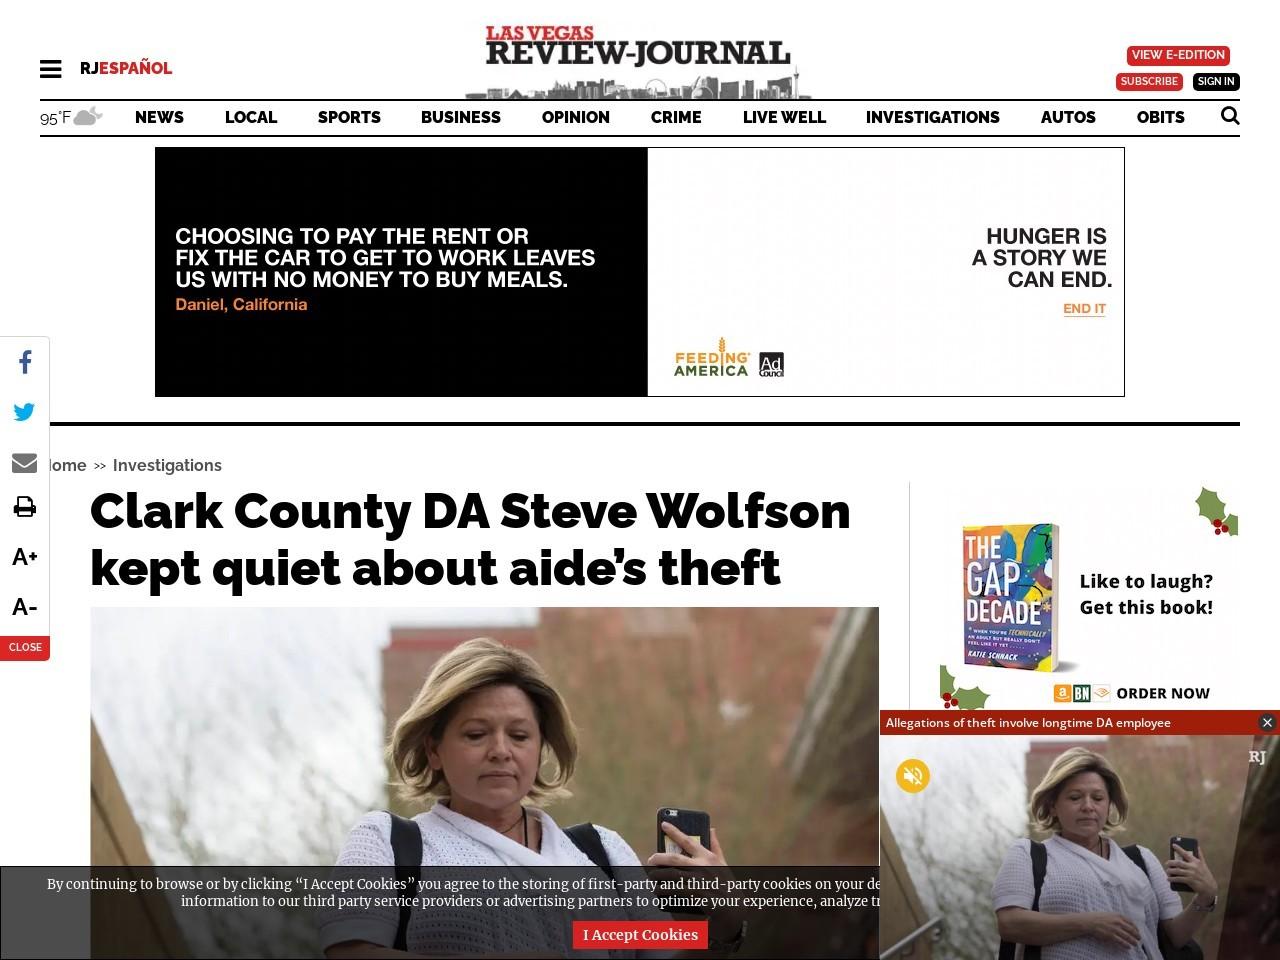 Clark County DA Steve Wolson kept quiet about aide's theft